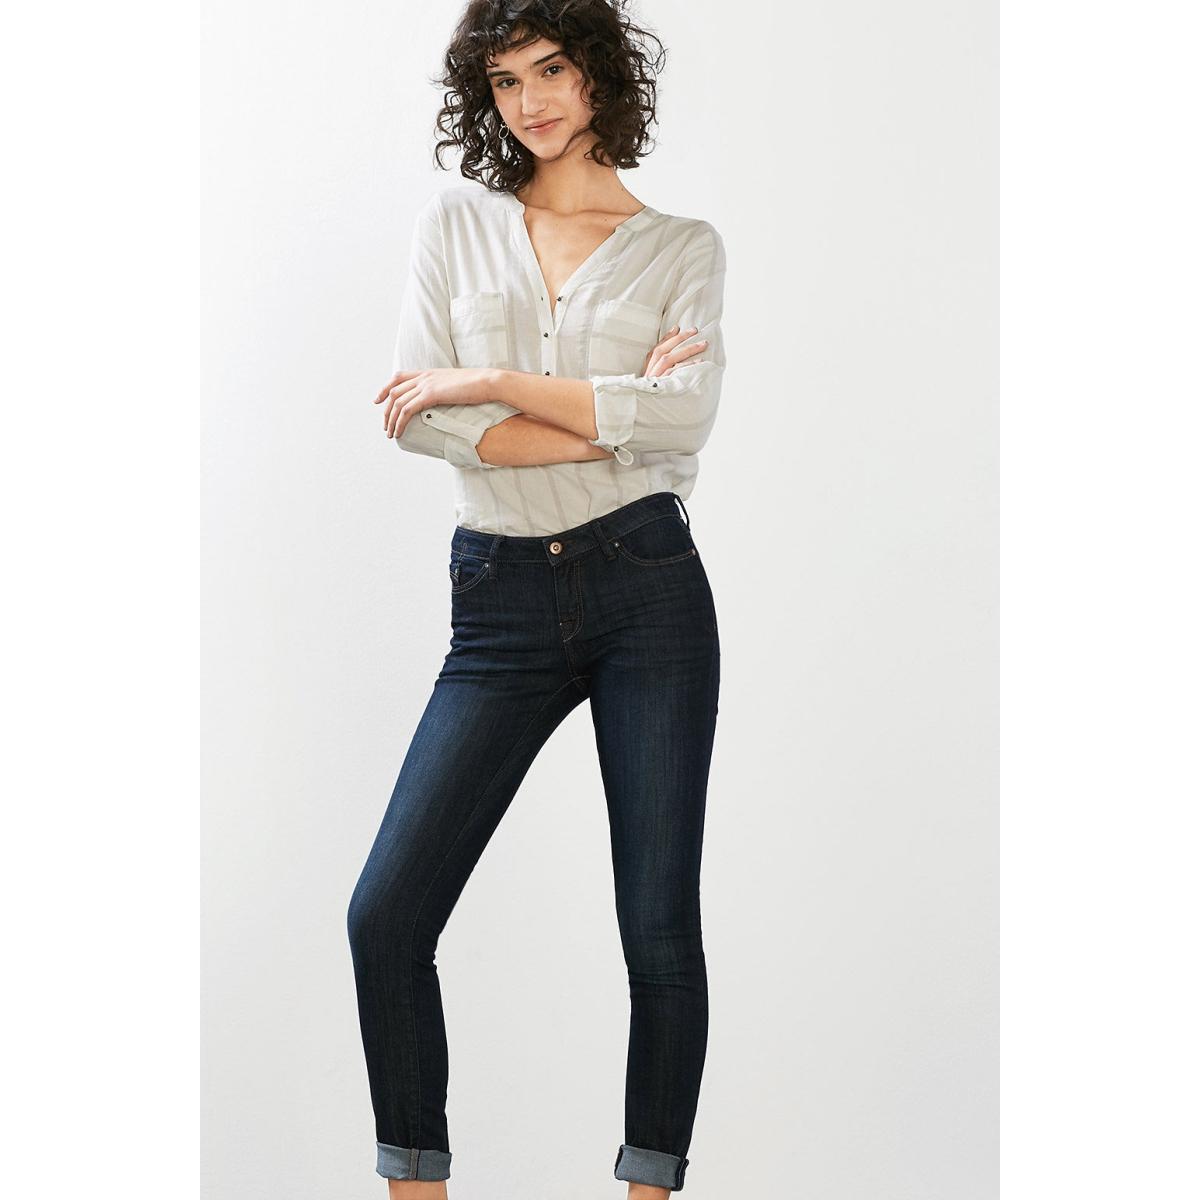 996cc1b910 edc jeans c900